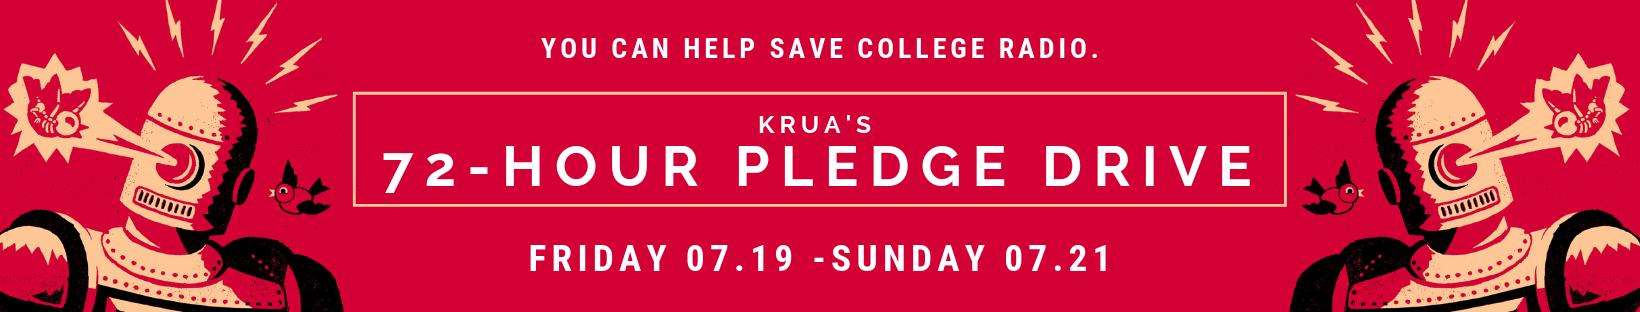 KRUA's 72-Hour pledge drive.png